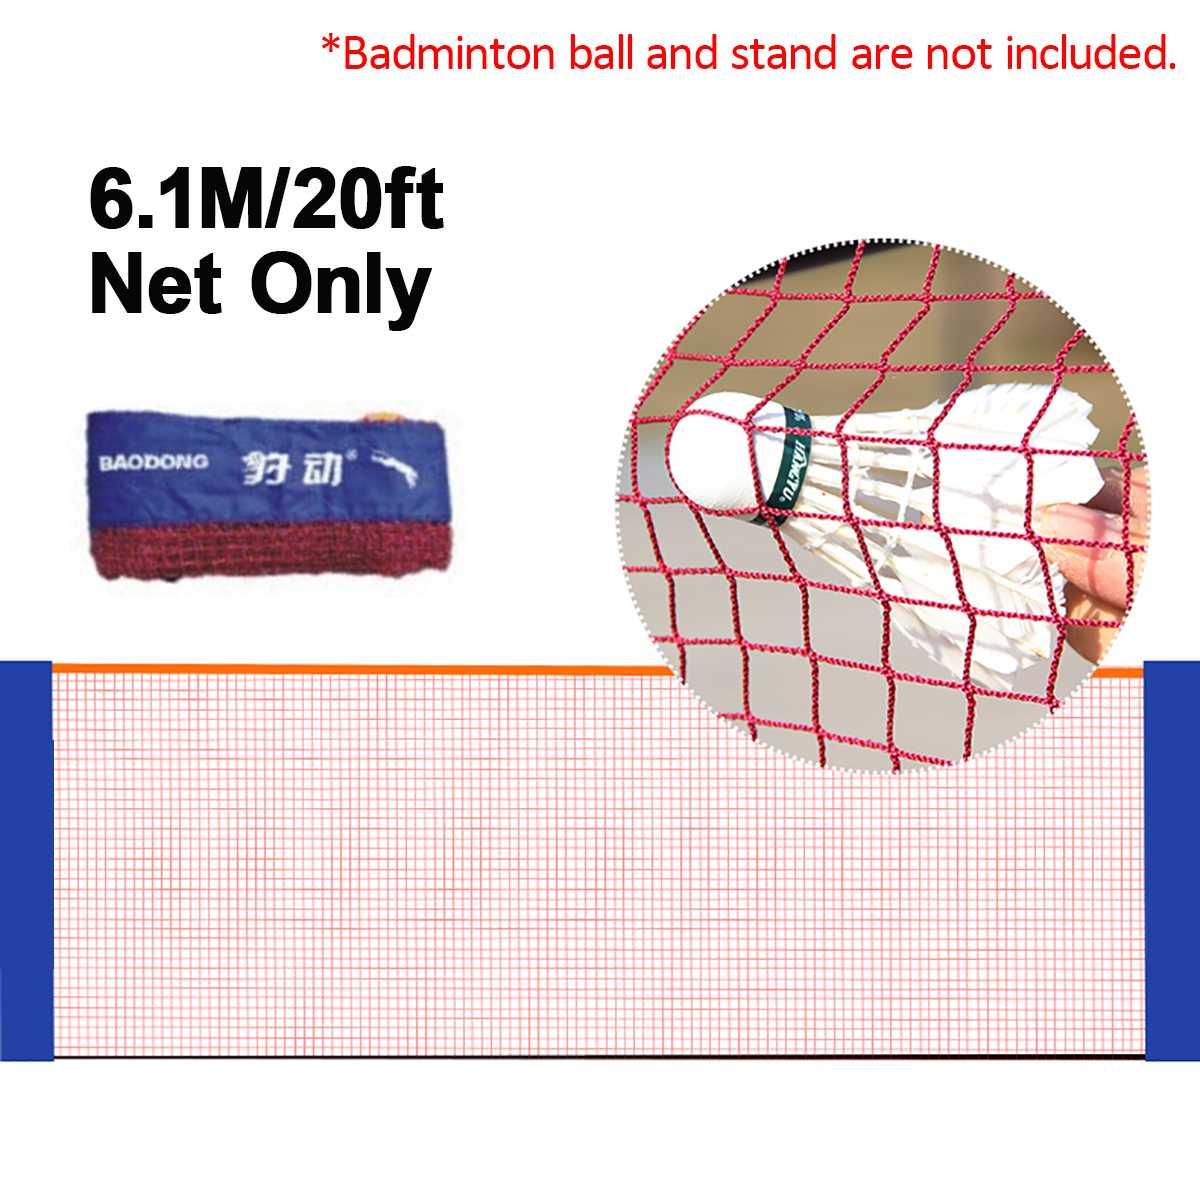 Standard Badminton Net Indoor Outdoor Sports Volleyball Training Portable Quickstart Tennis Badminton Square Net 6.1M